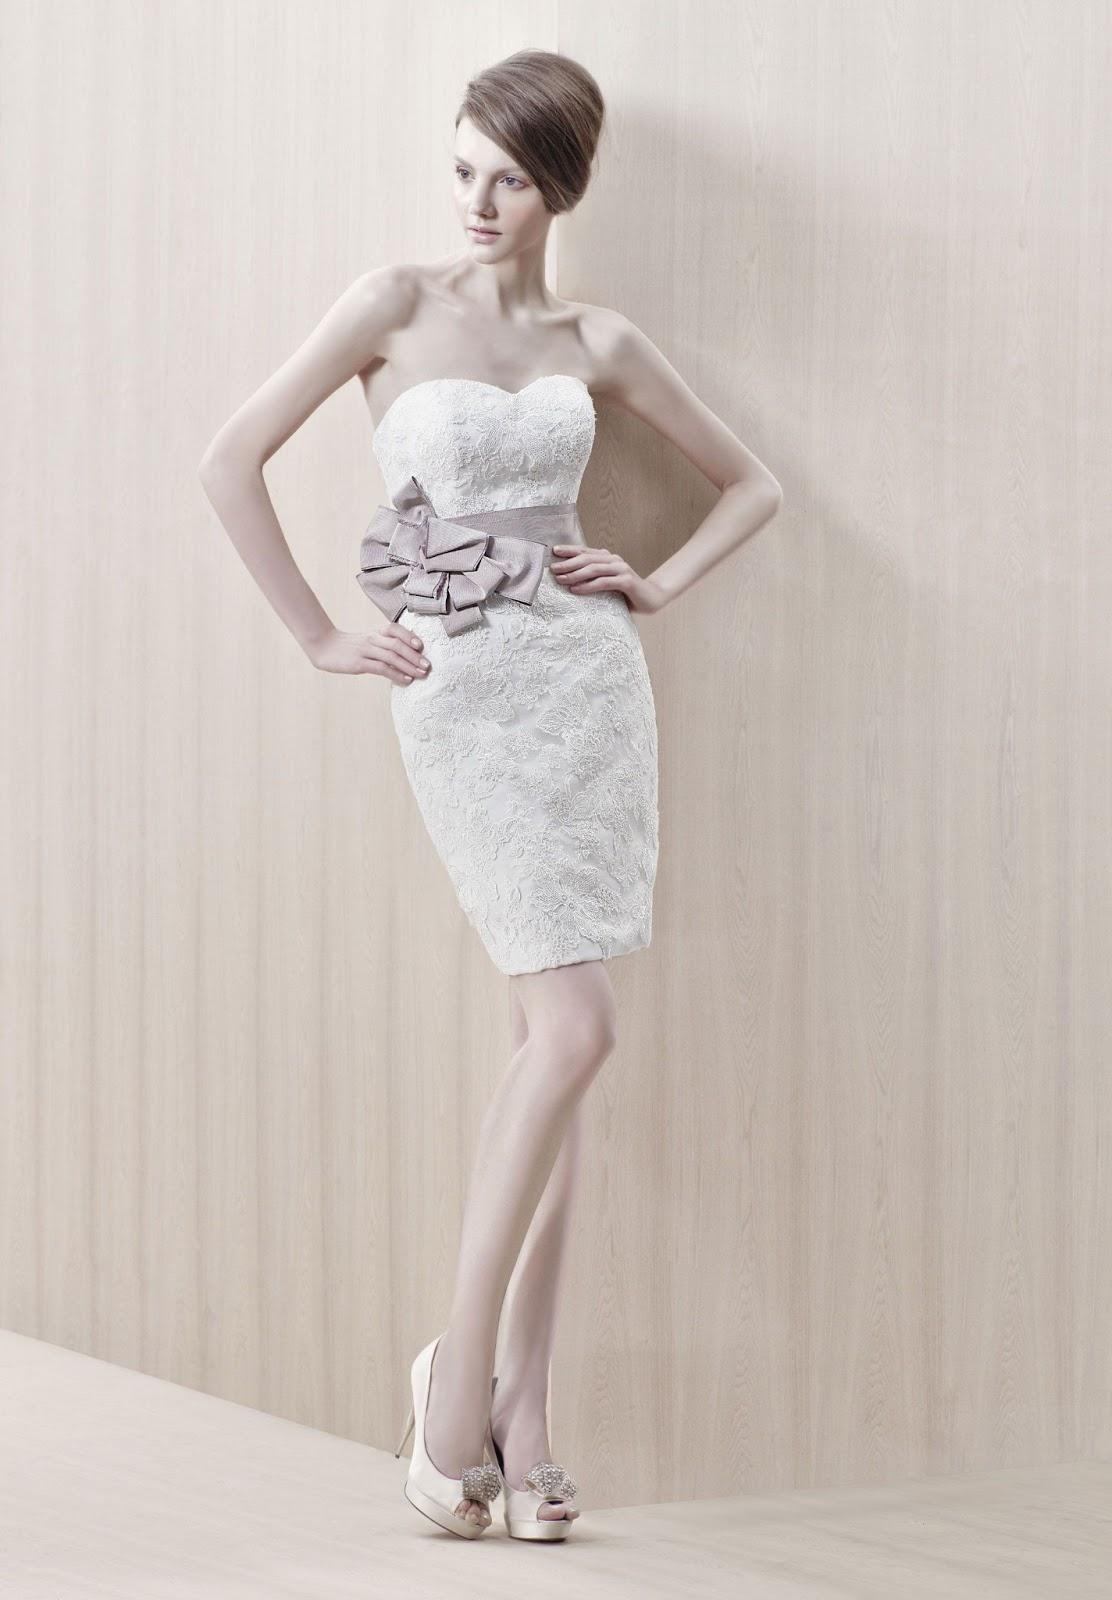 WhiteAzalea Destination Dresses Lace Wedding Dress for a Outdoor